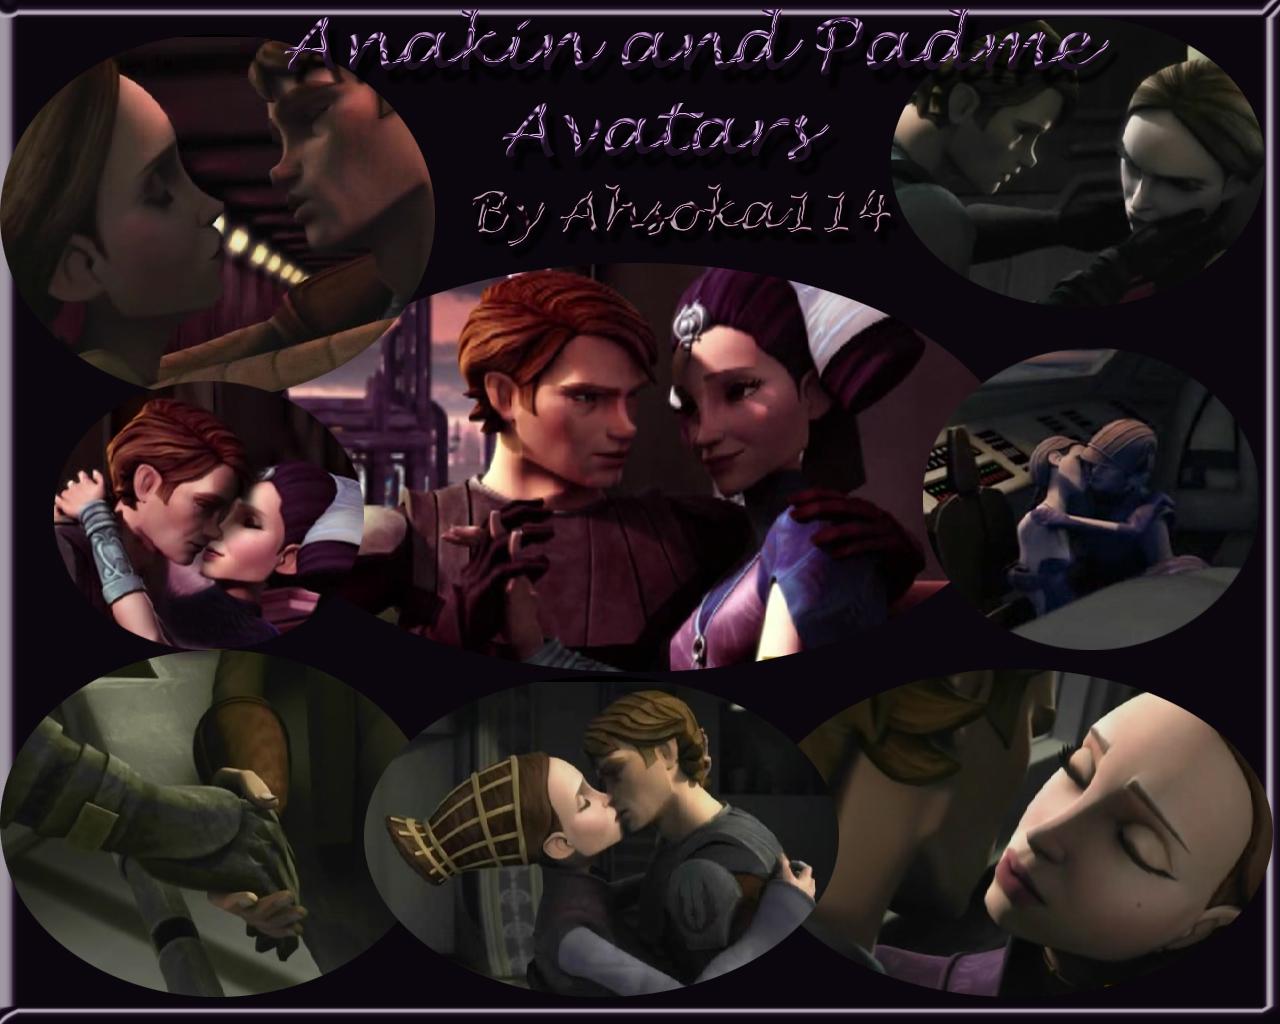 Free Anakin and Padme Avatars by Ahsoka114 on DeviantArt